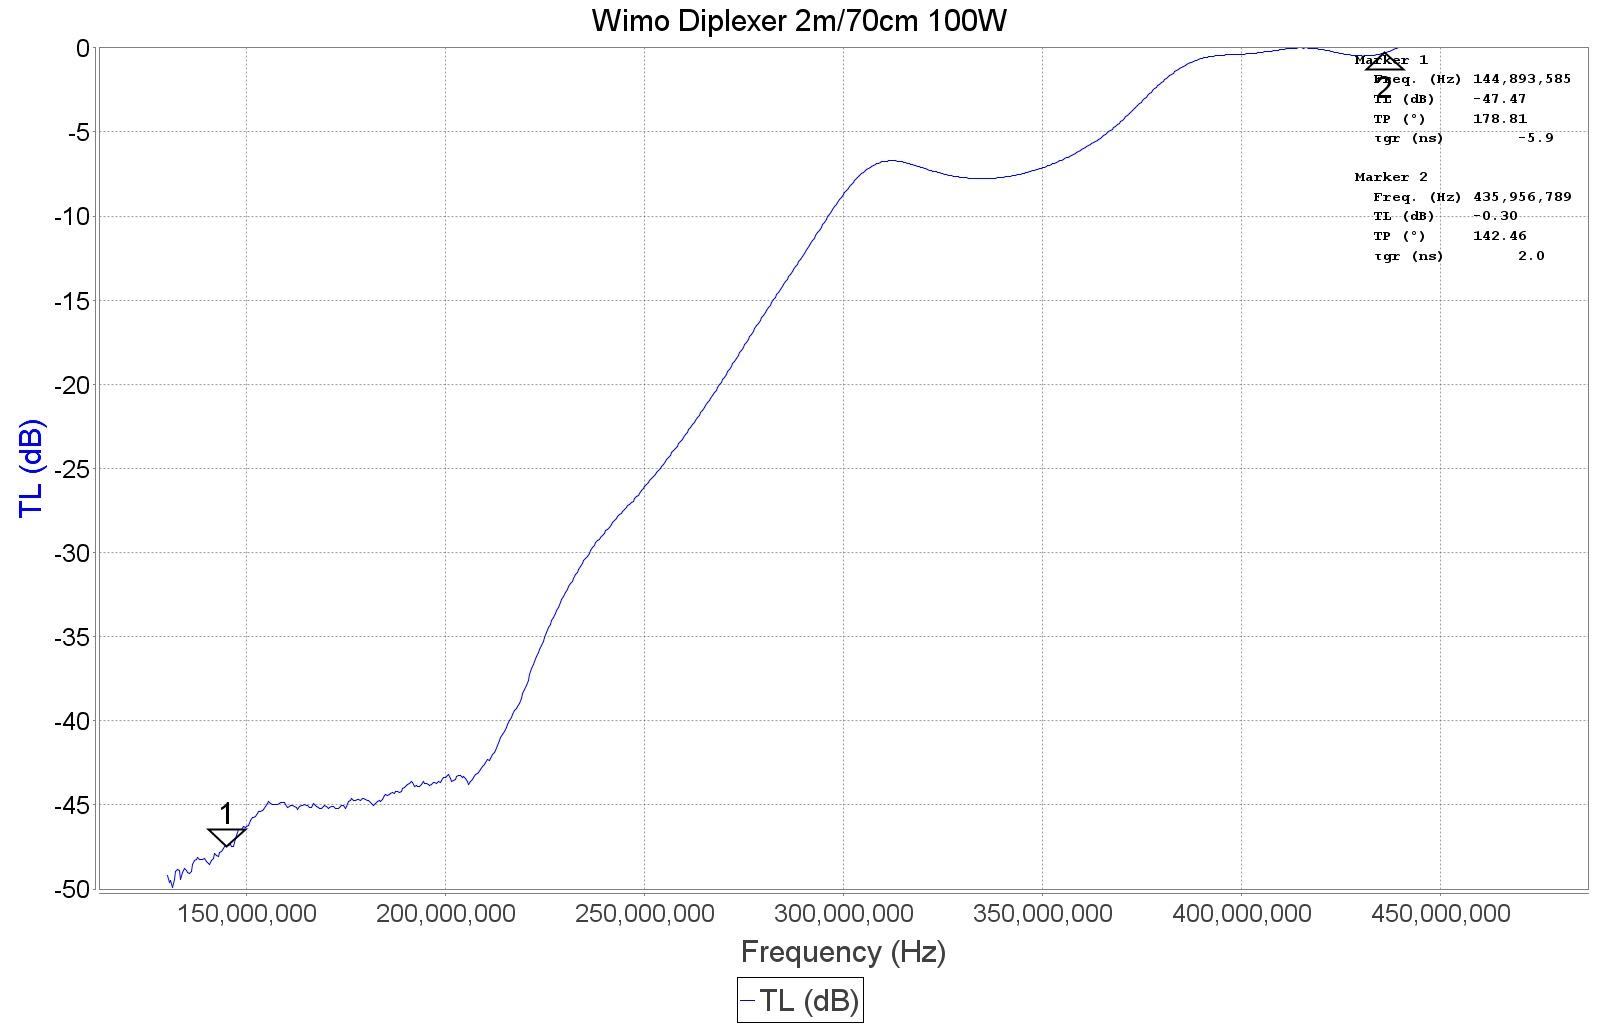 WIMO Diplexer #22030 - 2m/70cm 100W